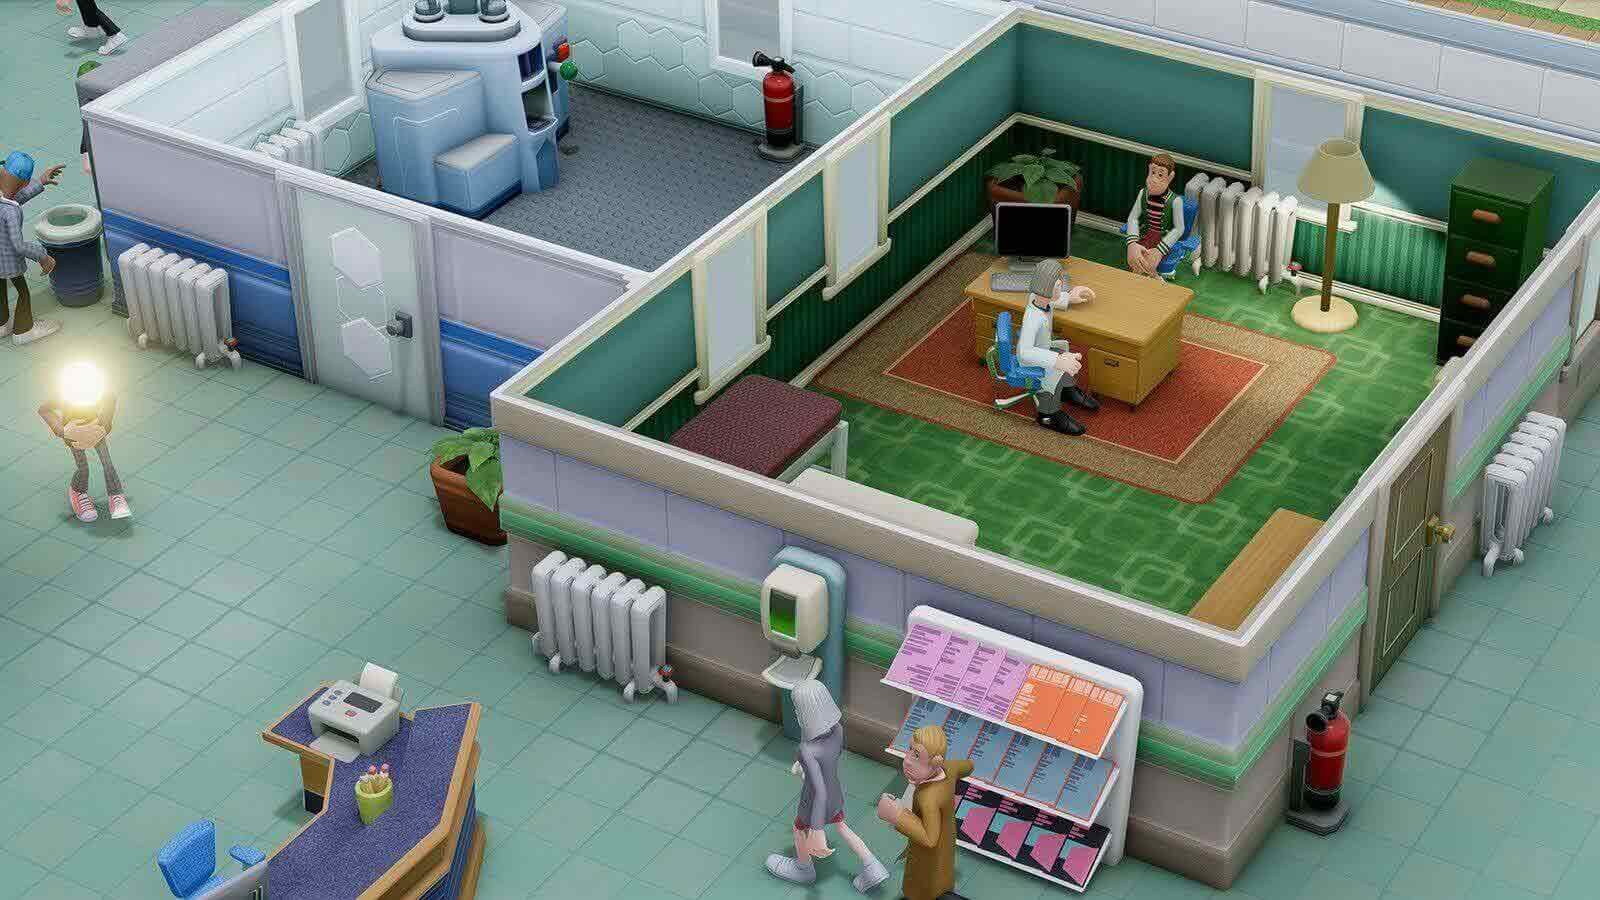 Two-Point-Hospital-โรงพยาบาลเพี้ยน-สุดฮา2